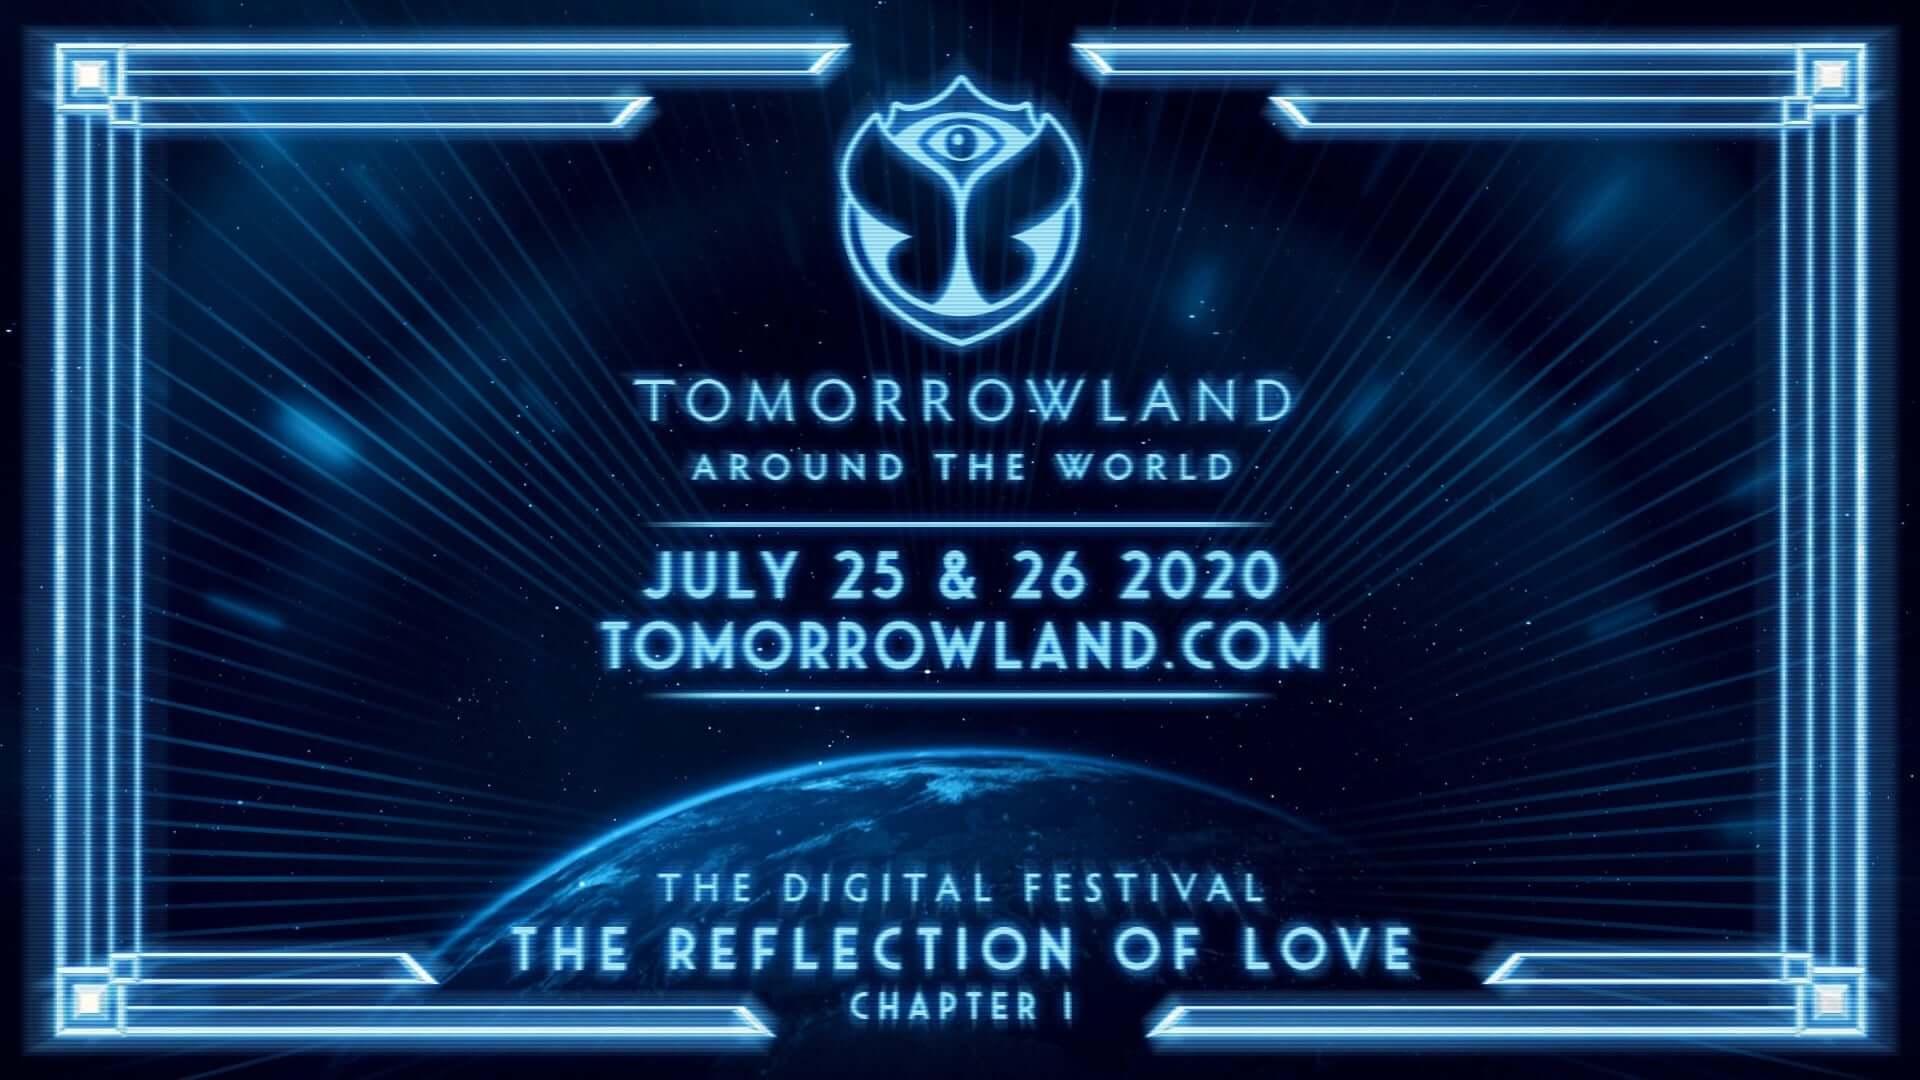 <TOMORROWLAND>が、史上初のデジタルフェスを開催決定!3Dバーチャルマップや初公開コンテンツが配信 music200605_tomorrowland_01-1920x1080